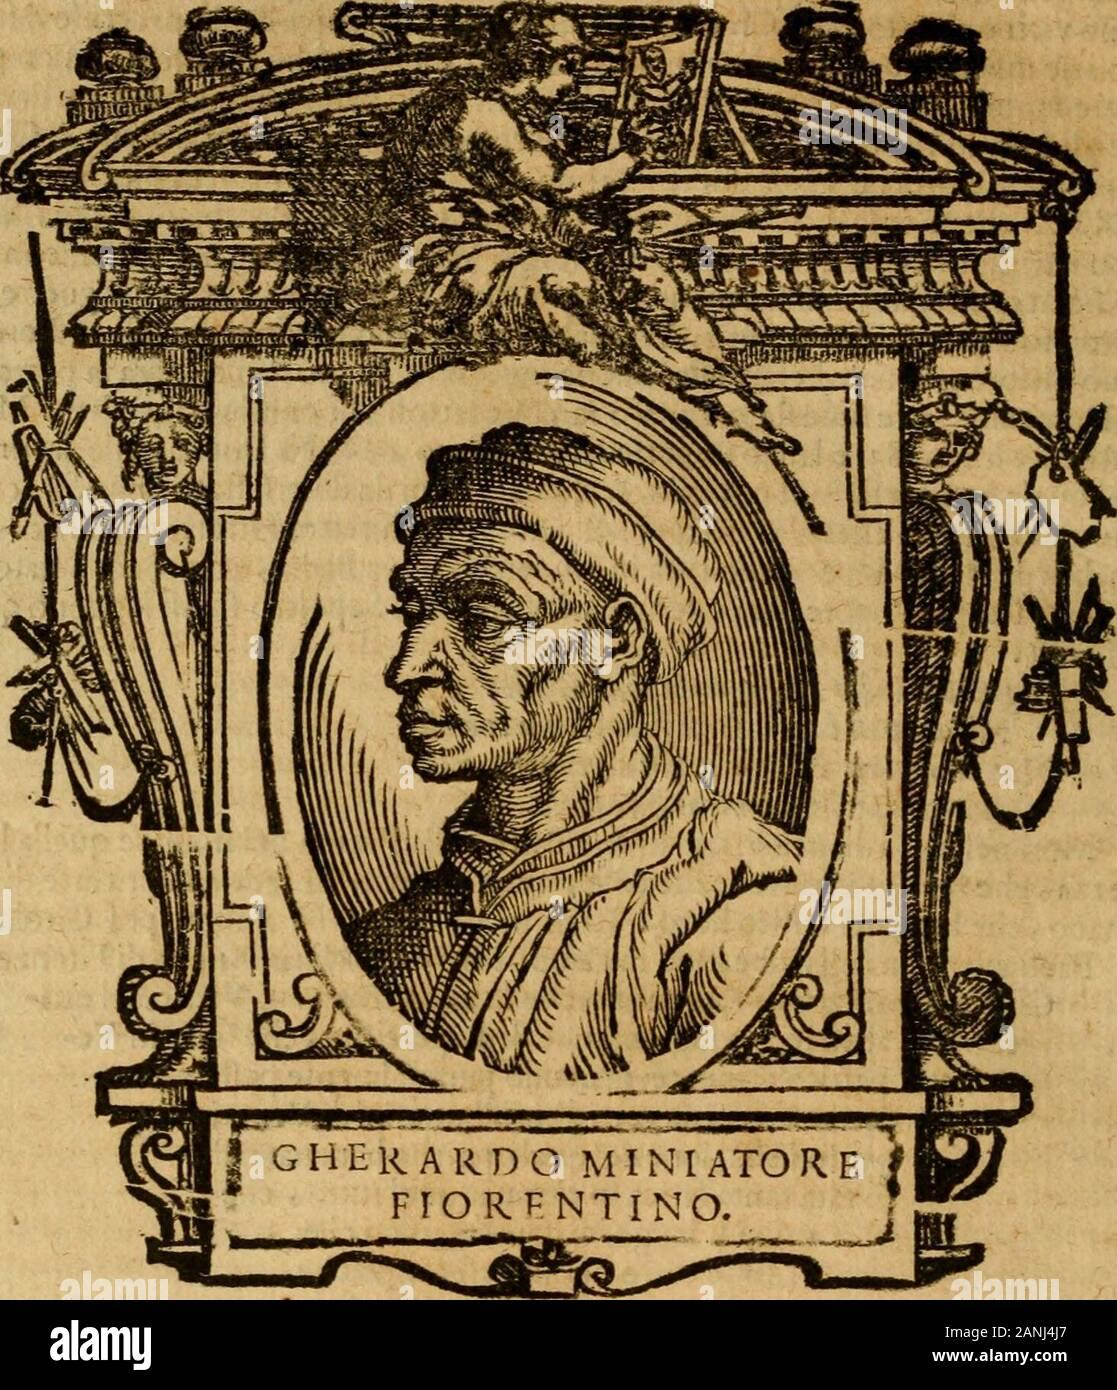 Fine Lavori Cila Roma booksubjectartists stock photos & booksubjectartists stock